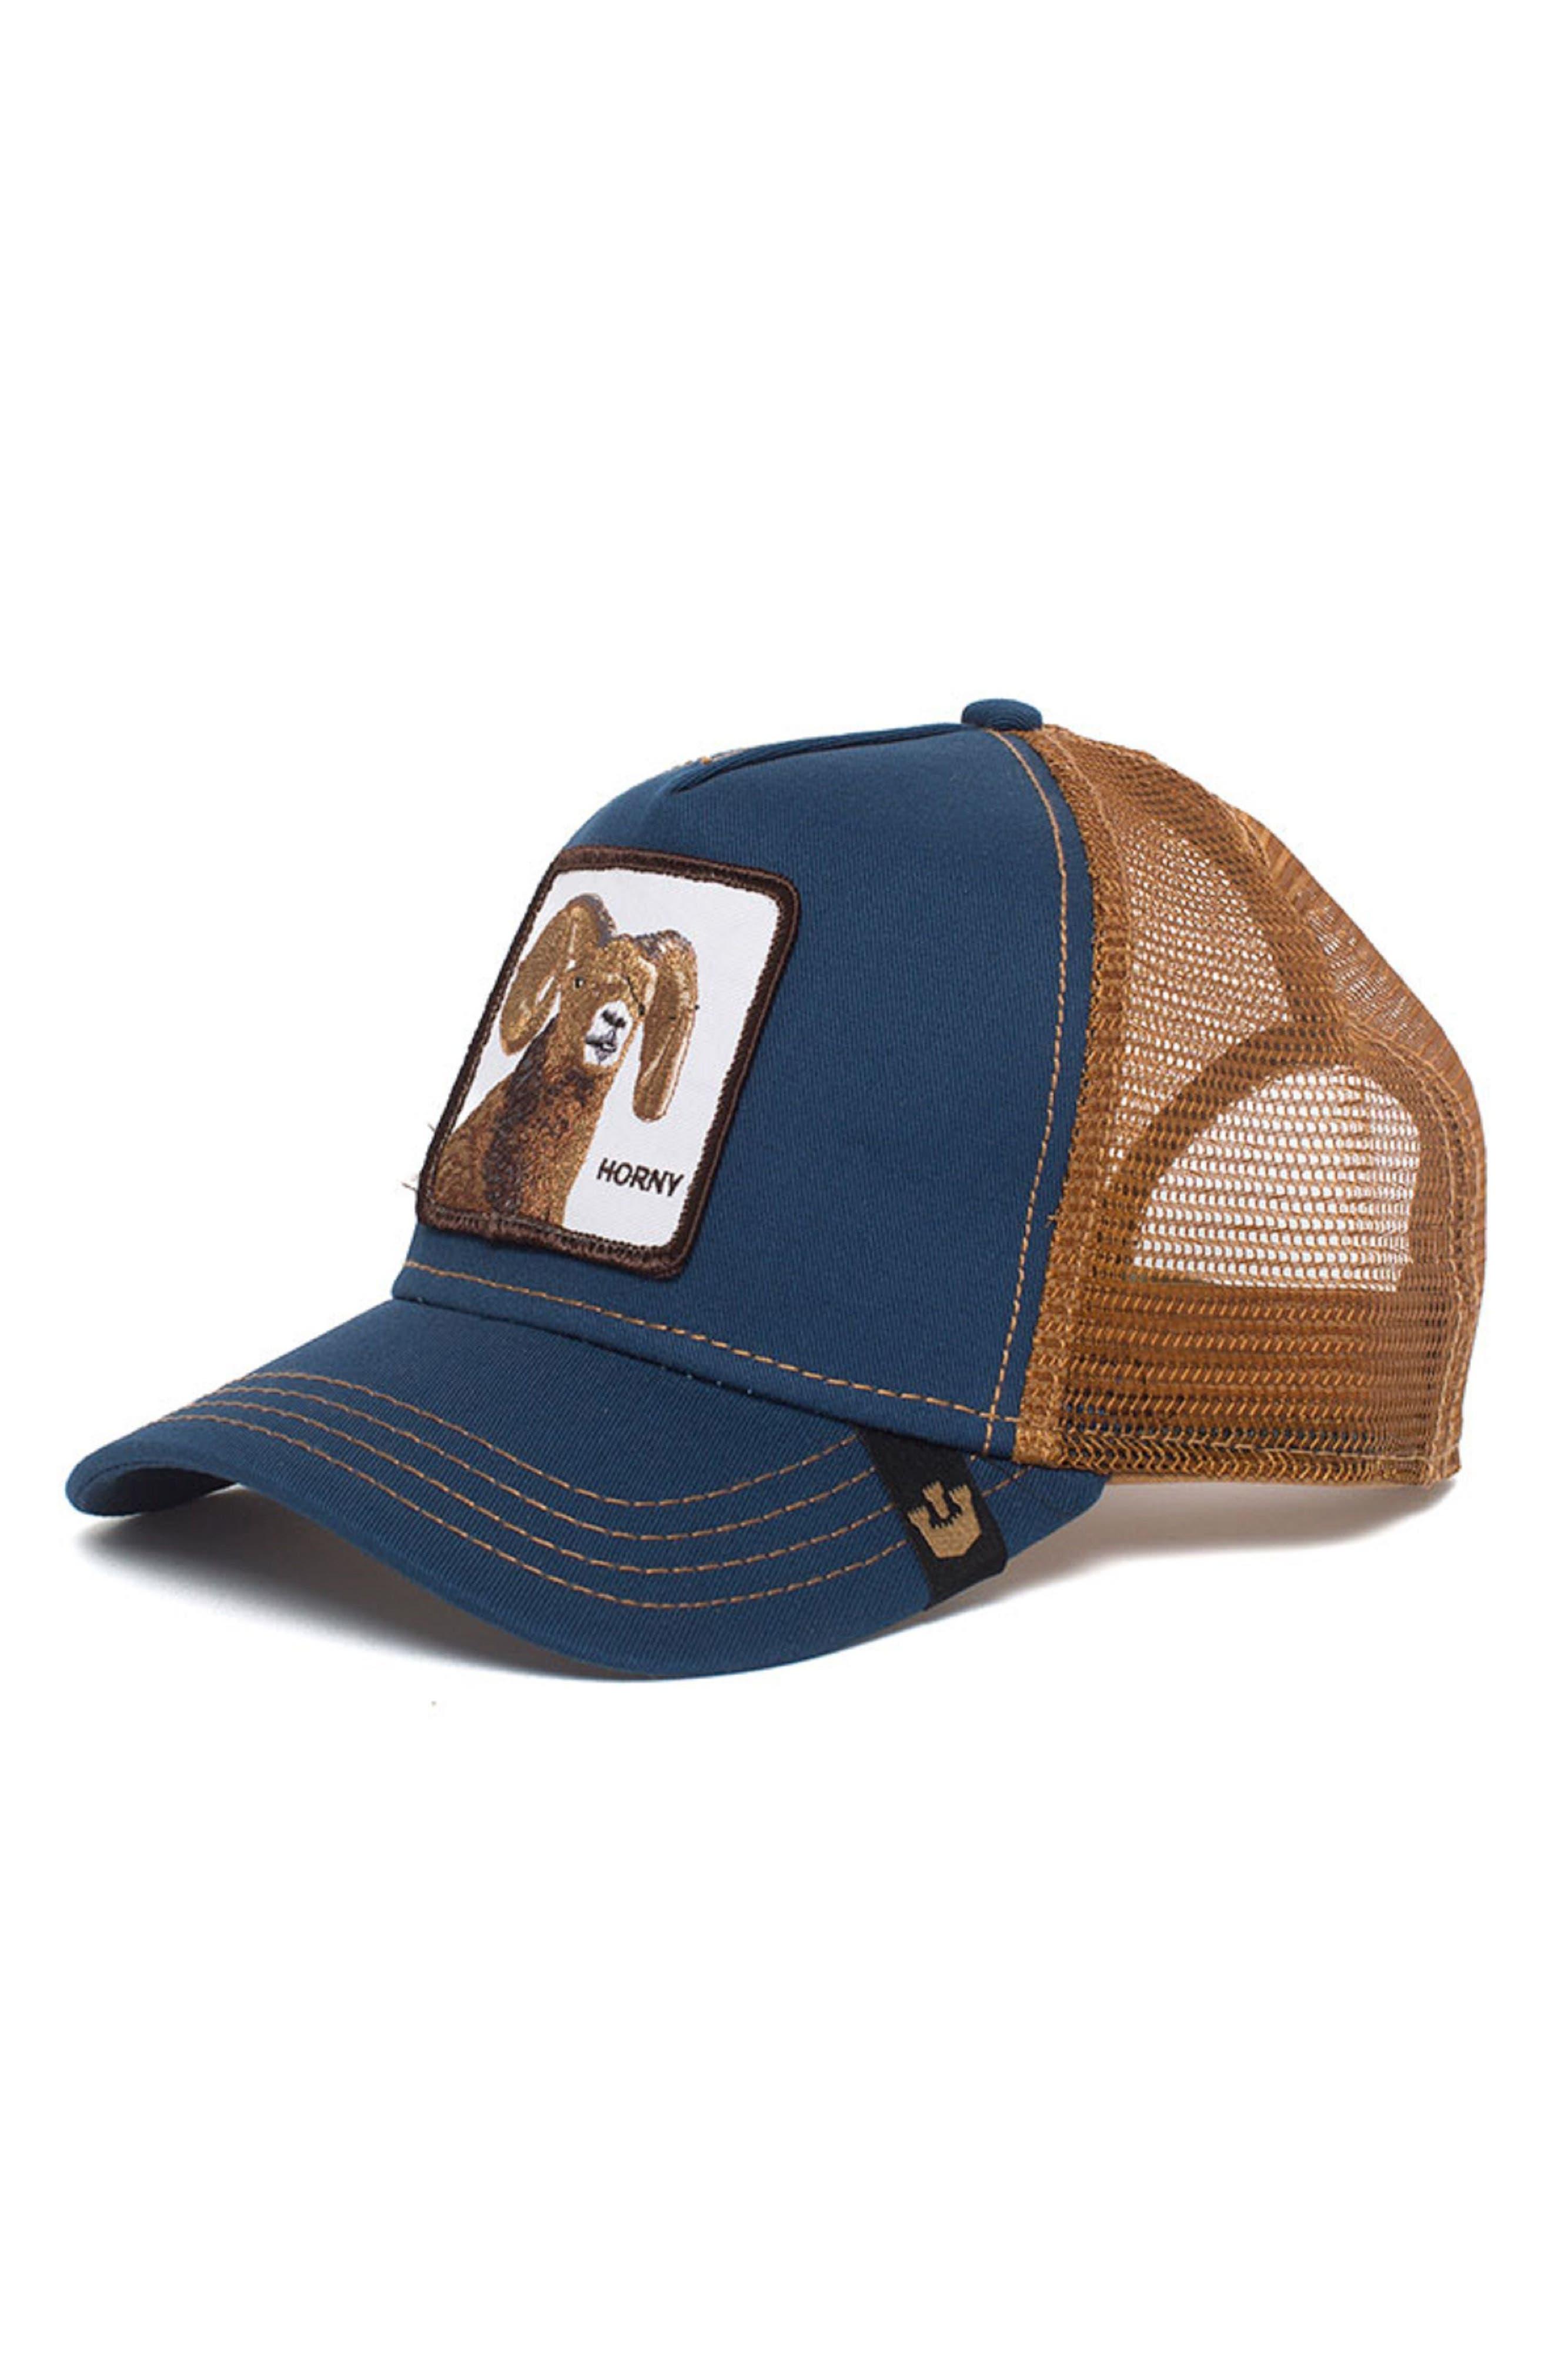 Big Horn Trucker Hat,                             Main thumbnail 1, color,                             Navy